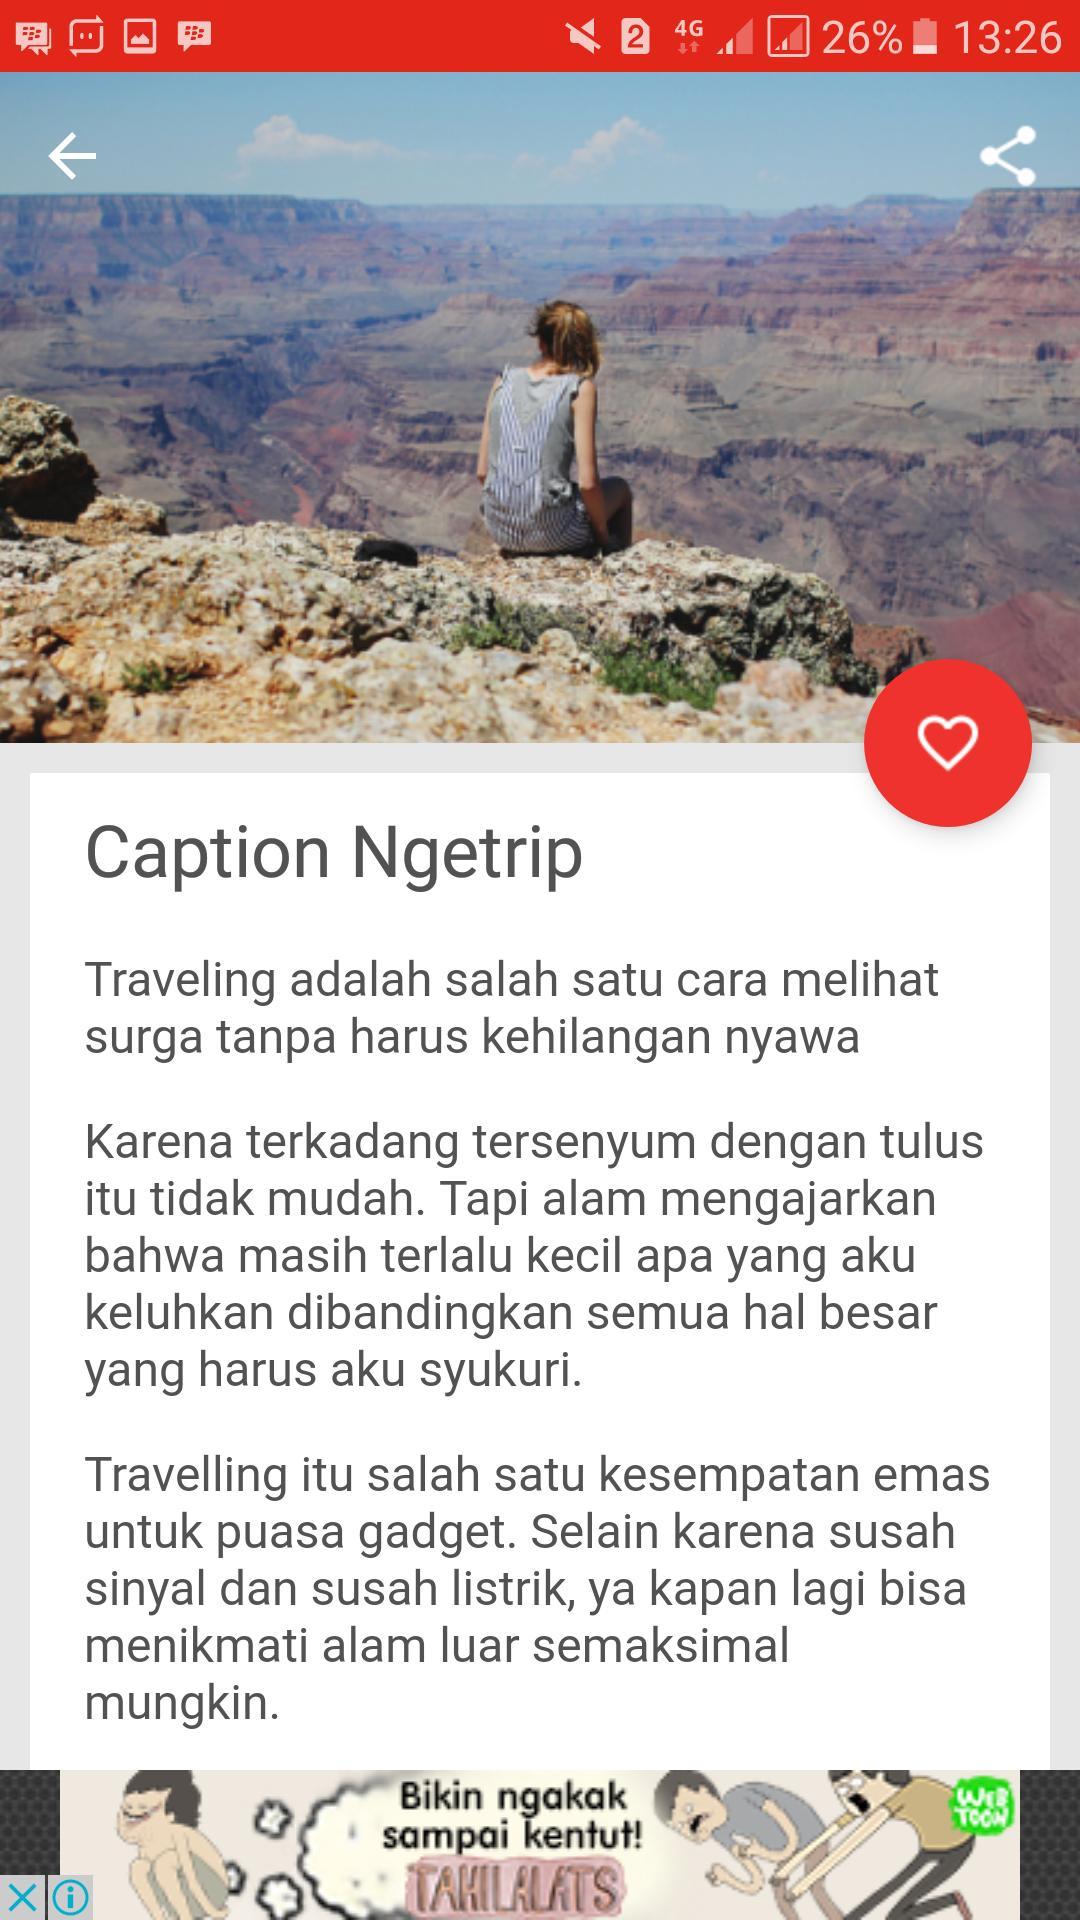 Caption IG Bagus Keren For Android APK Download